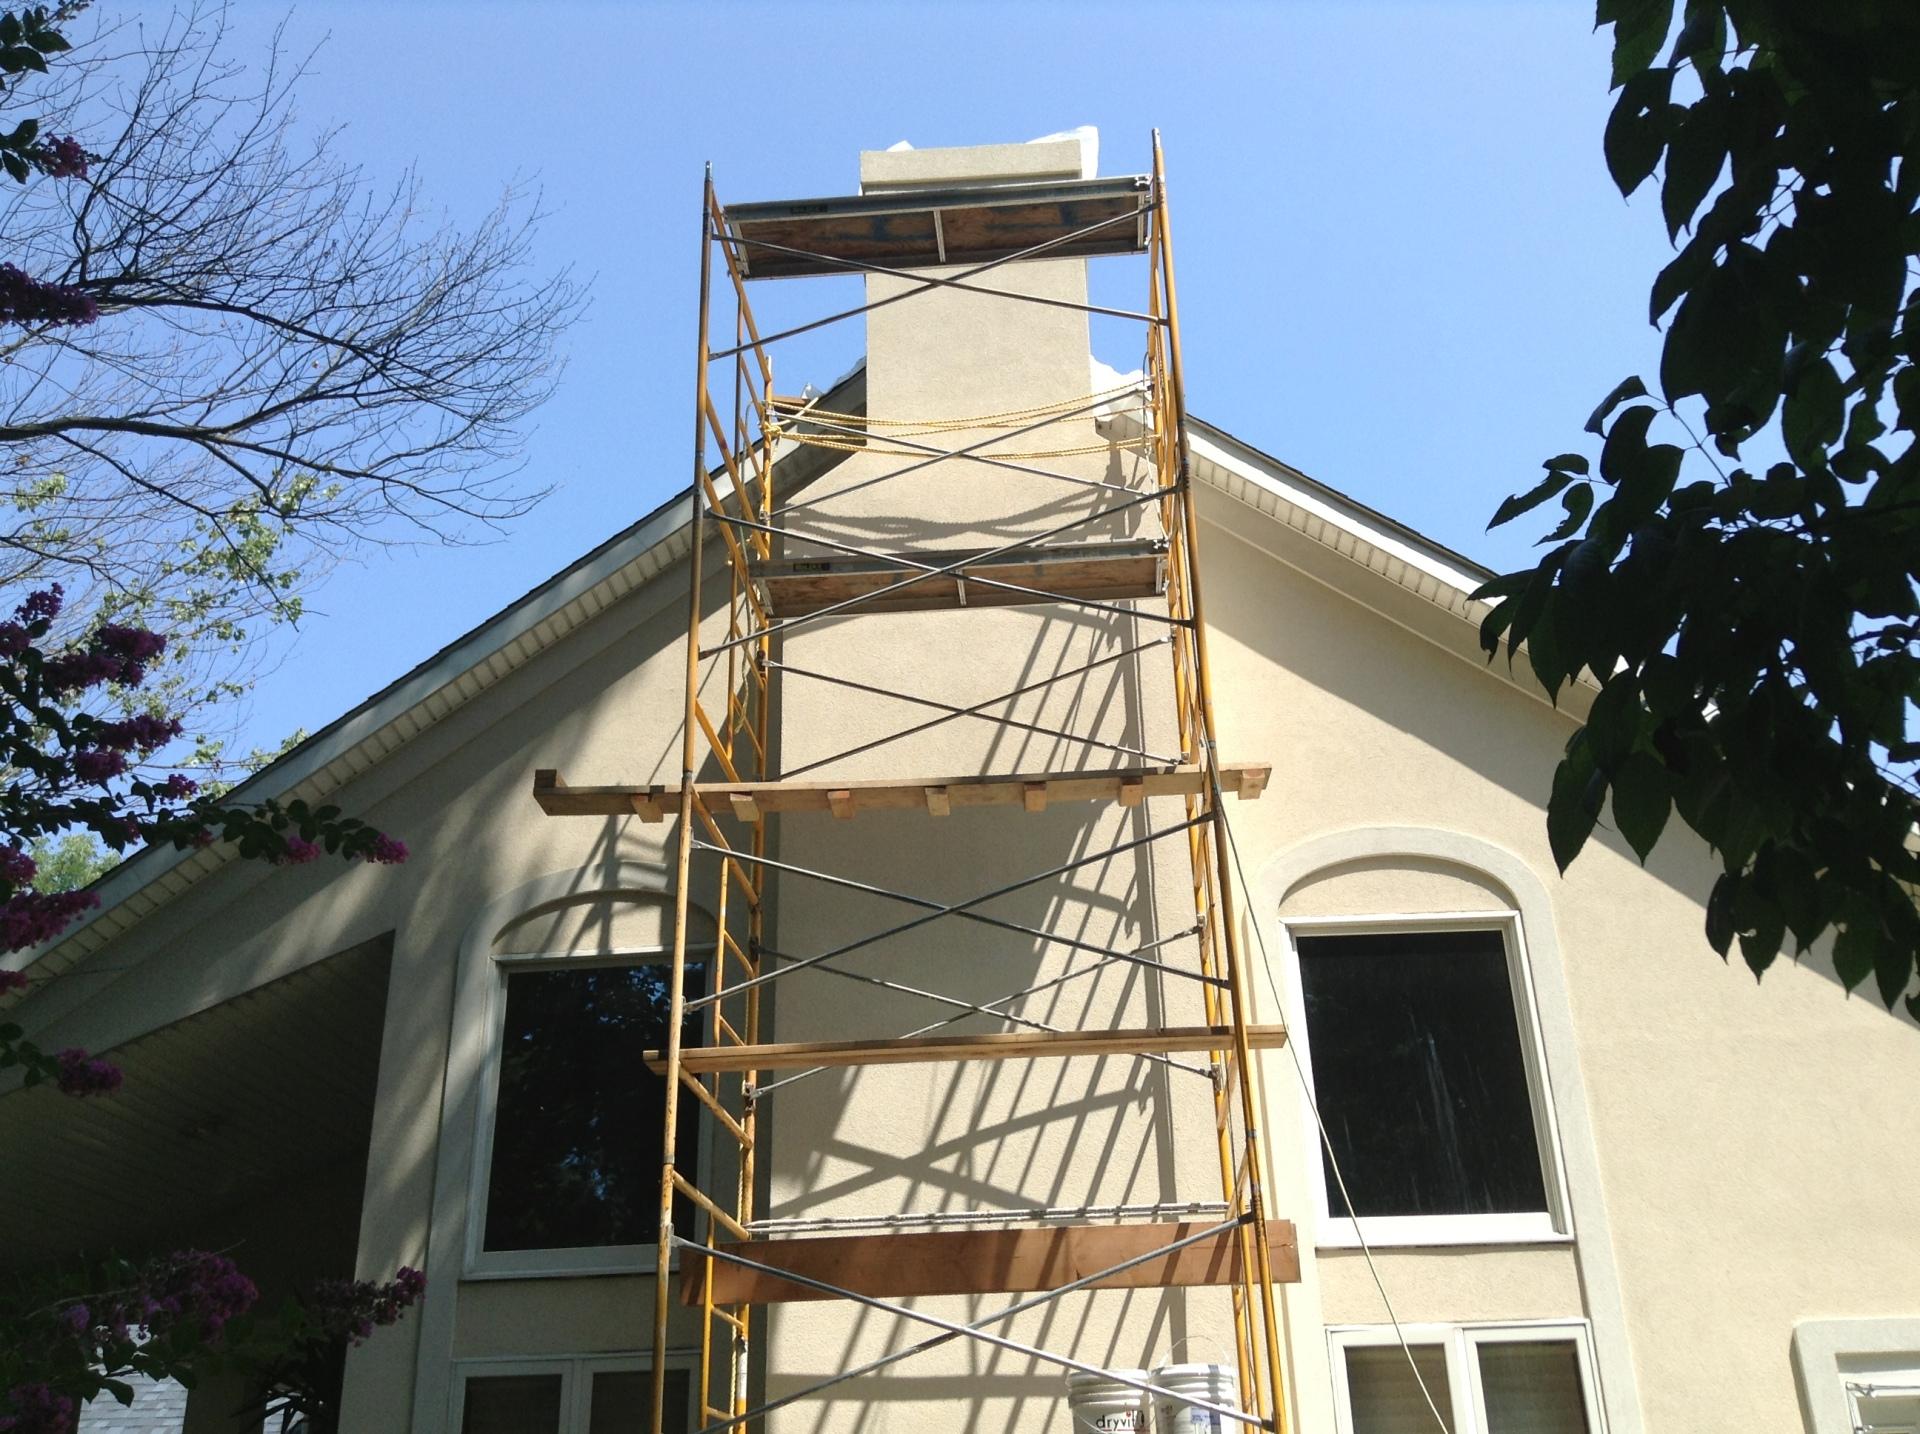 Dryvit - New Construction / Repair